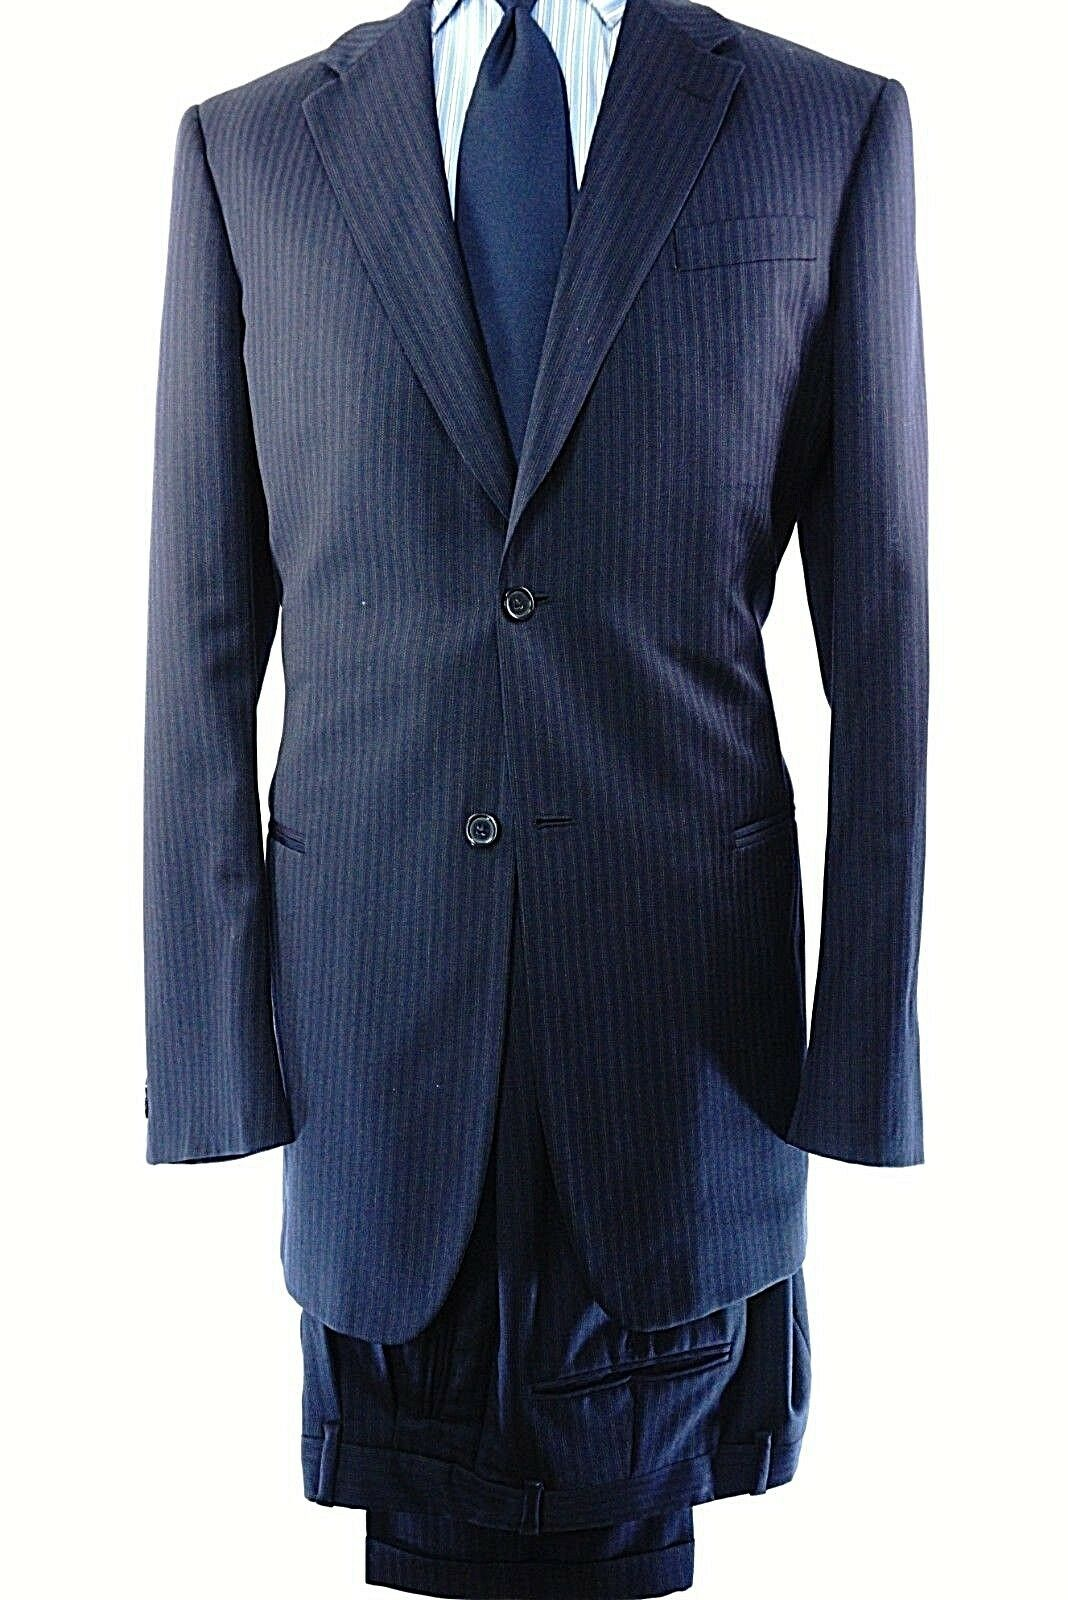 women Karan Men's 42 35 XL Suit Navy bluee Pinstripe 100% Wool made in   402